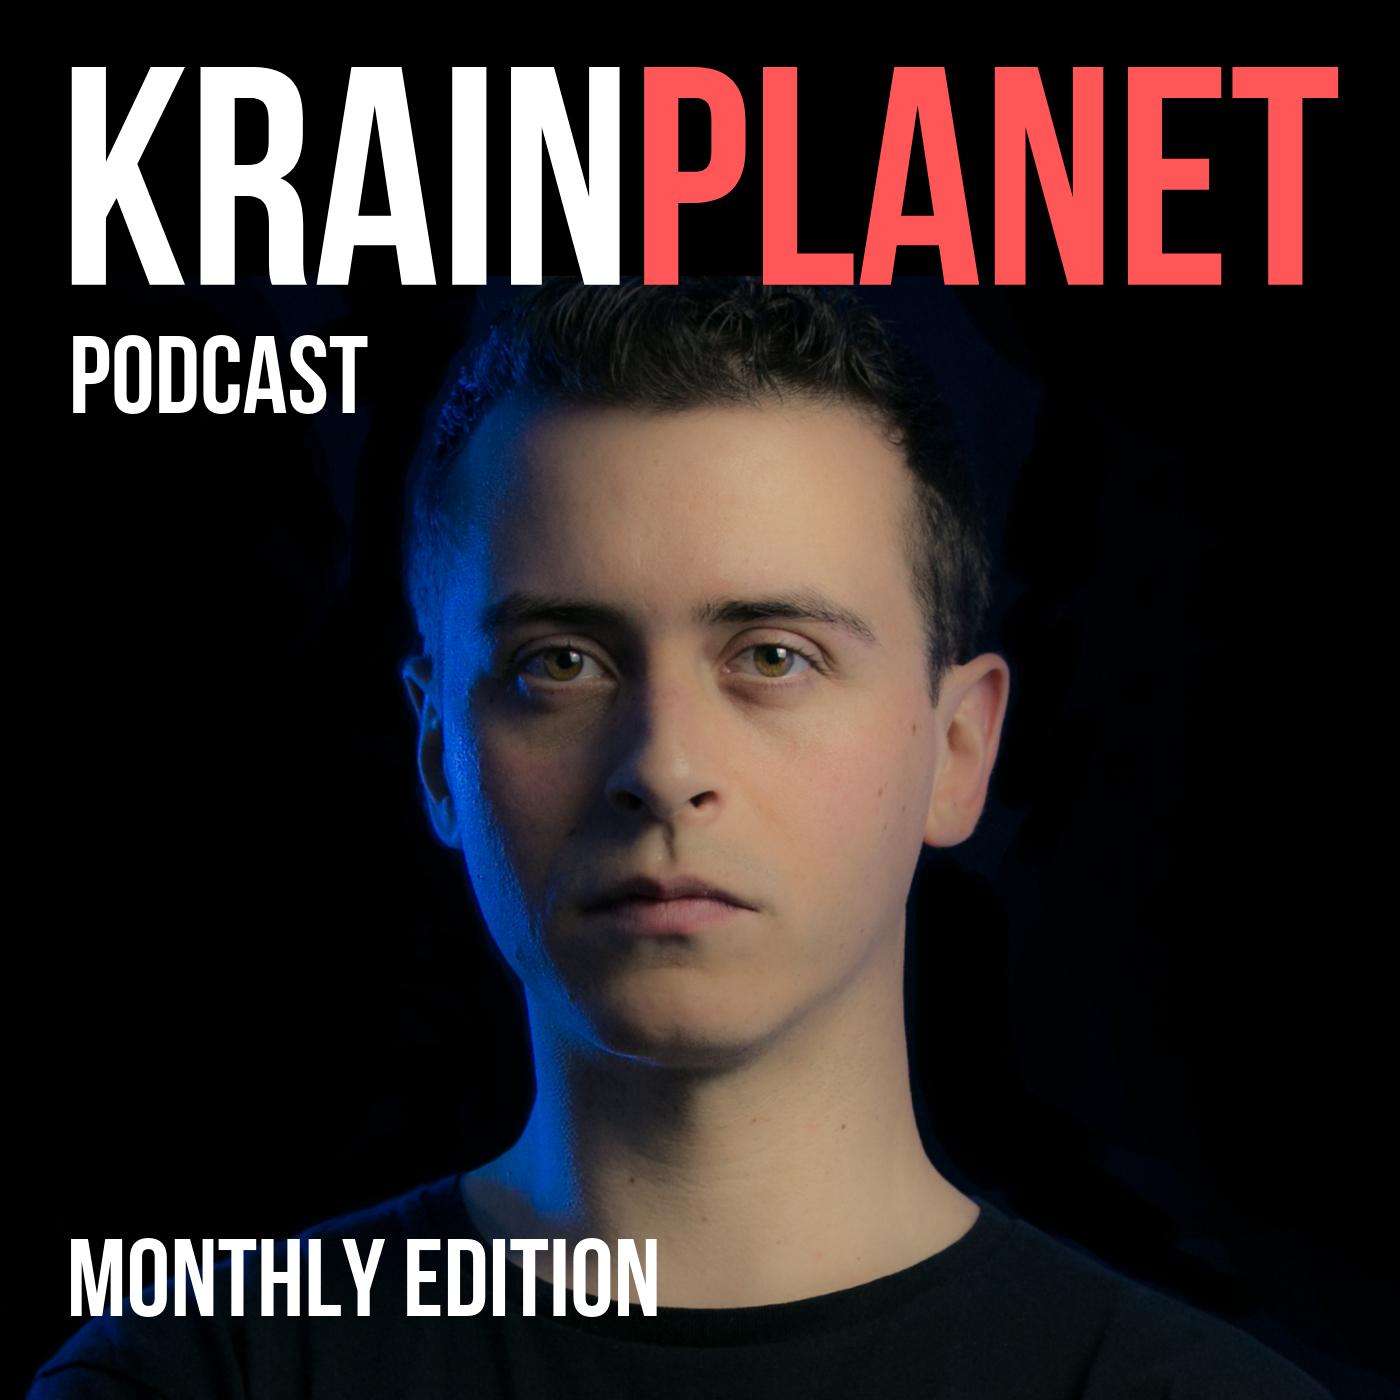 Krain Planet 005 - With new music from Boris Brejcha, DJ Rush & Gary Beck, Metodi Hristov, Avision, Tiger Stripes...